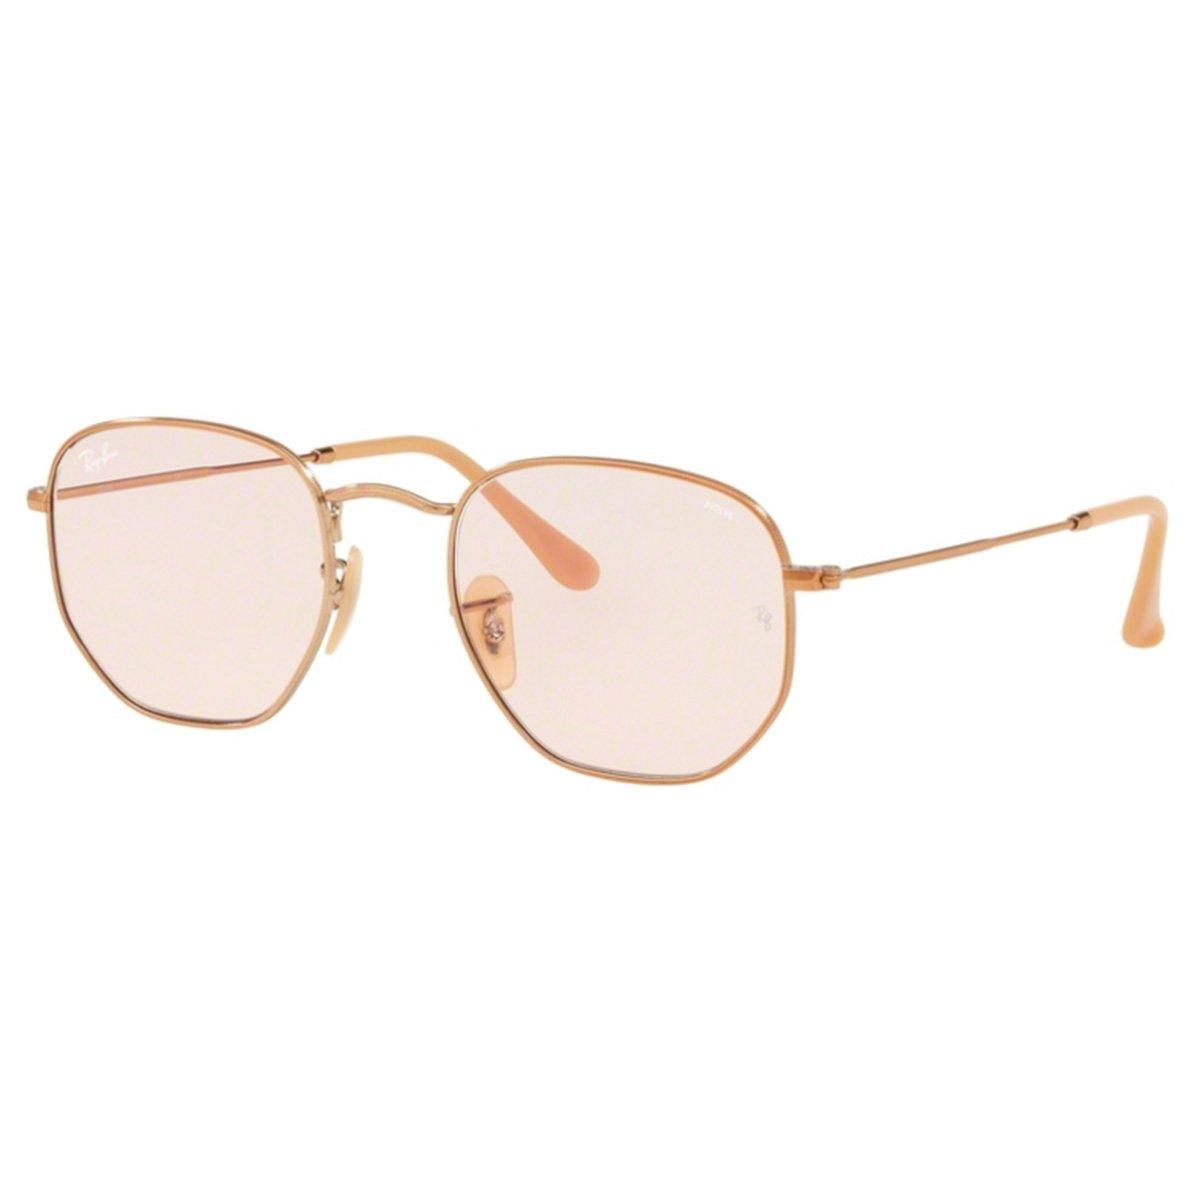 Compre Óculos de Sol Ray Ban Hexagonal OverSized em 10X   Tri-Jóia Shop 2b270be3c5